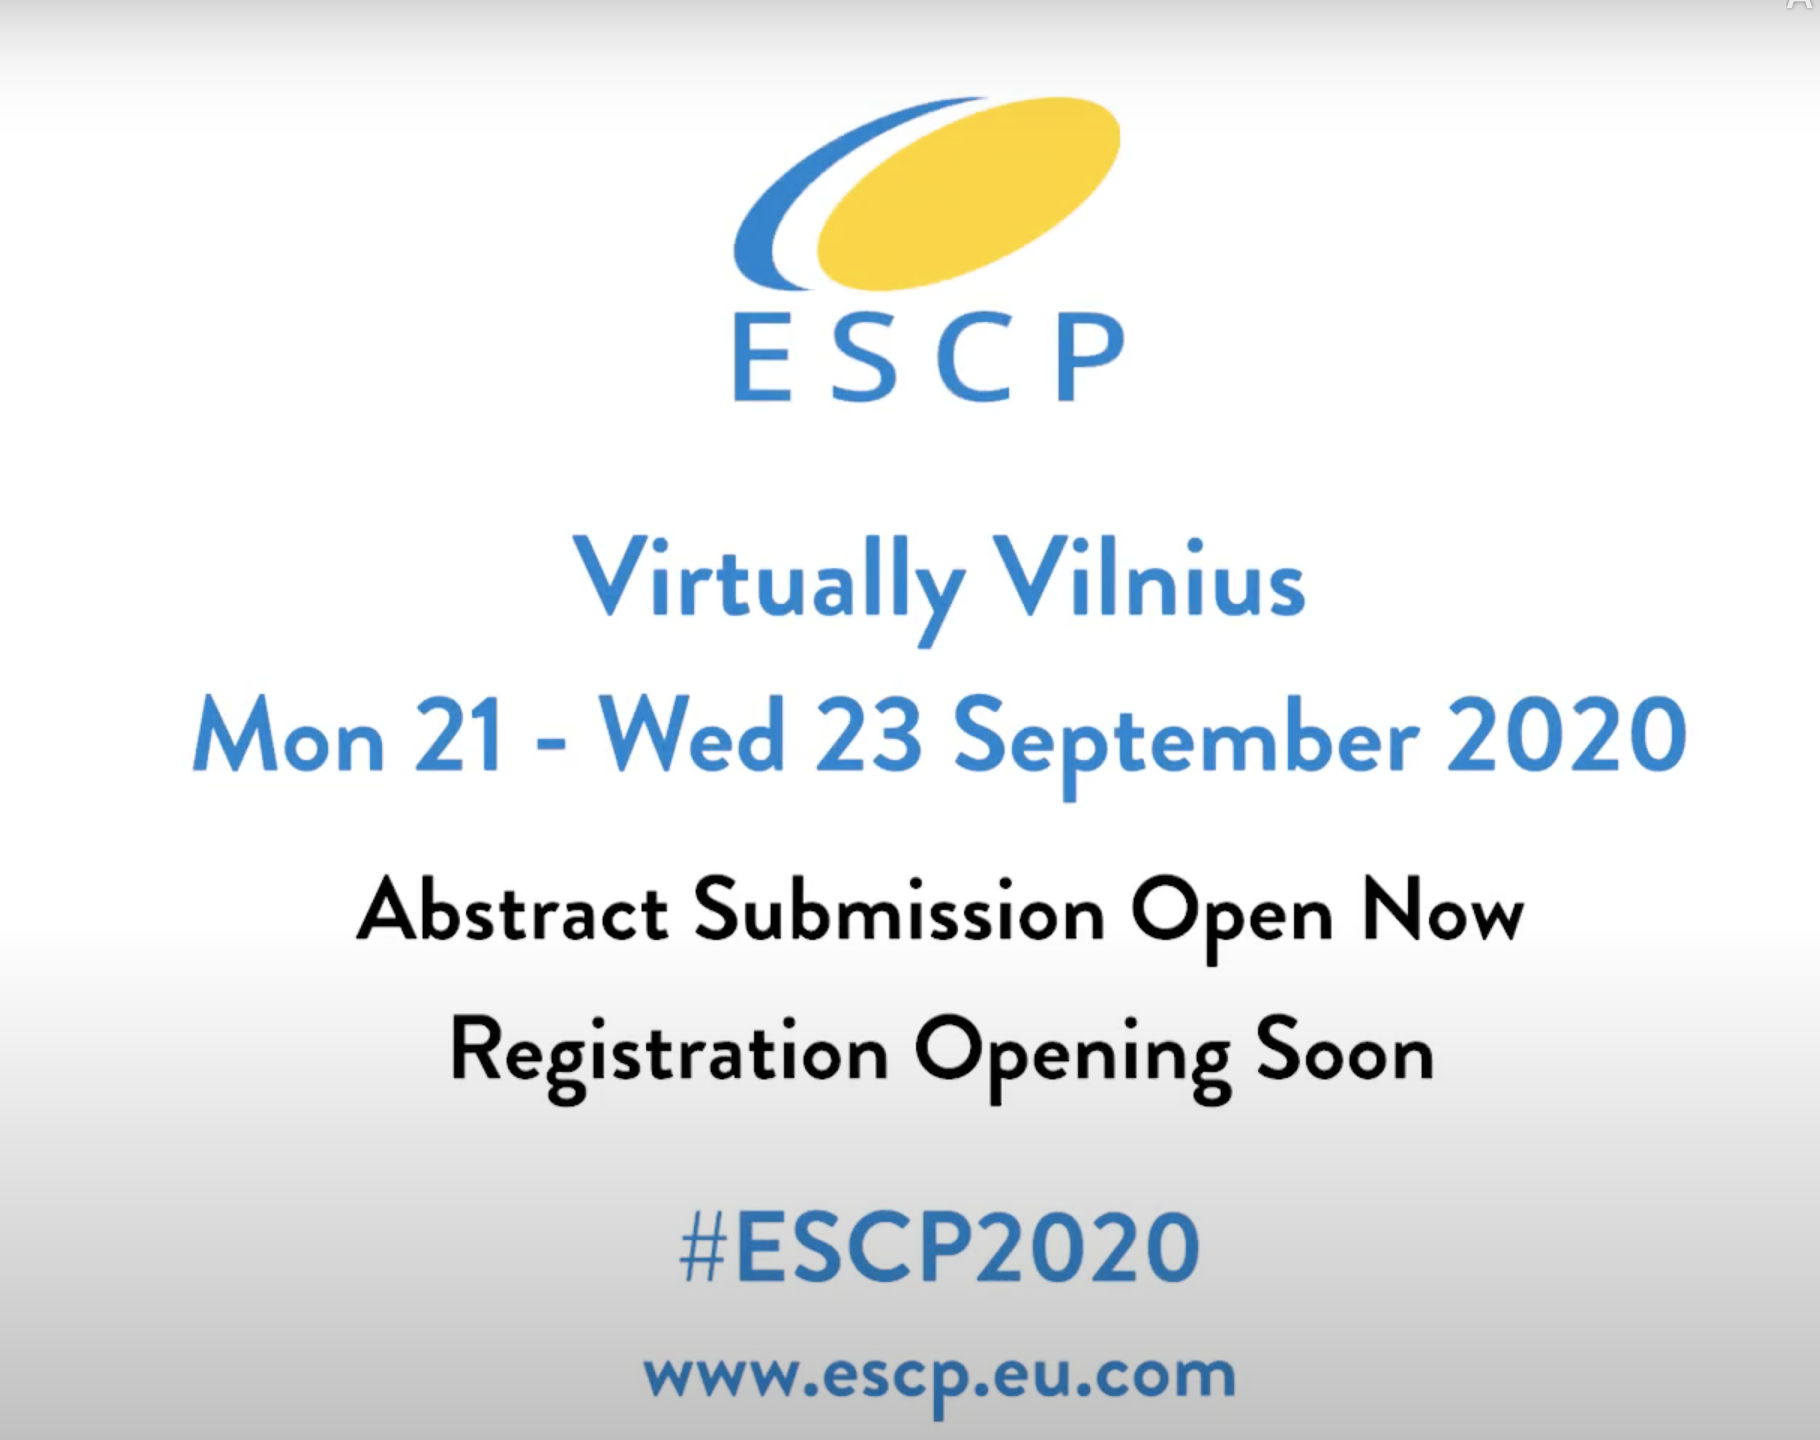 ESCP (European Society of Coloproctology)